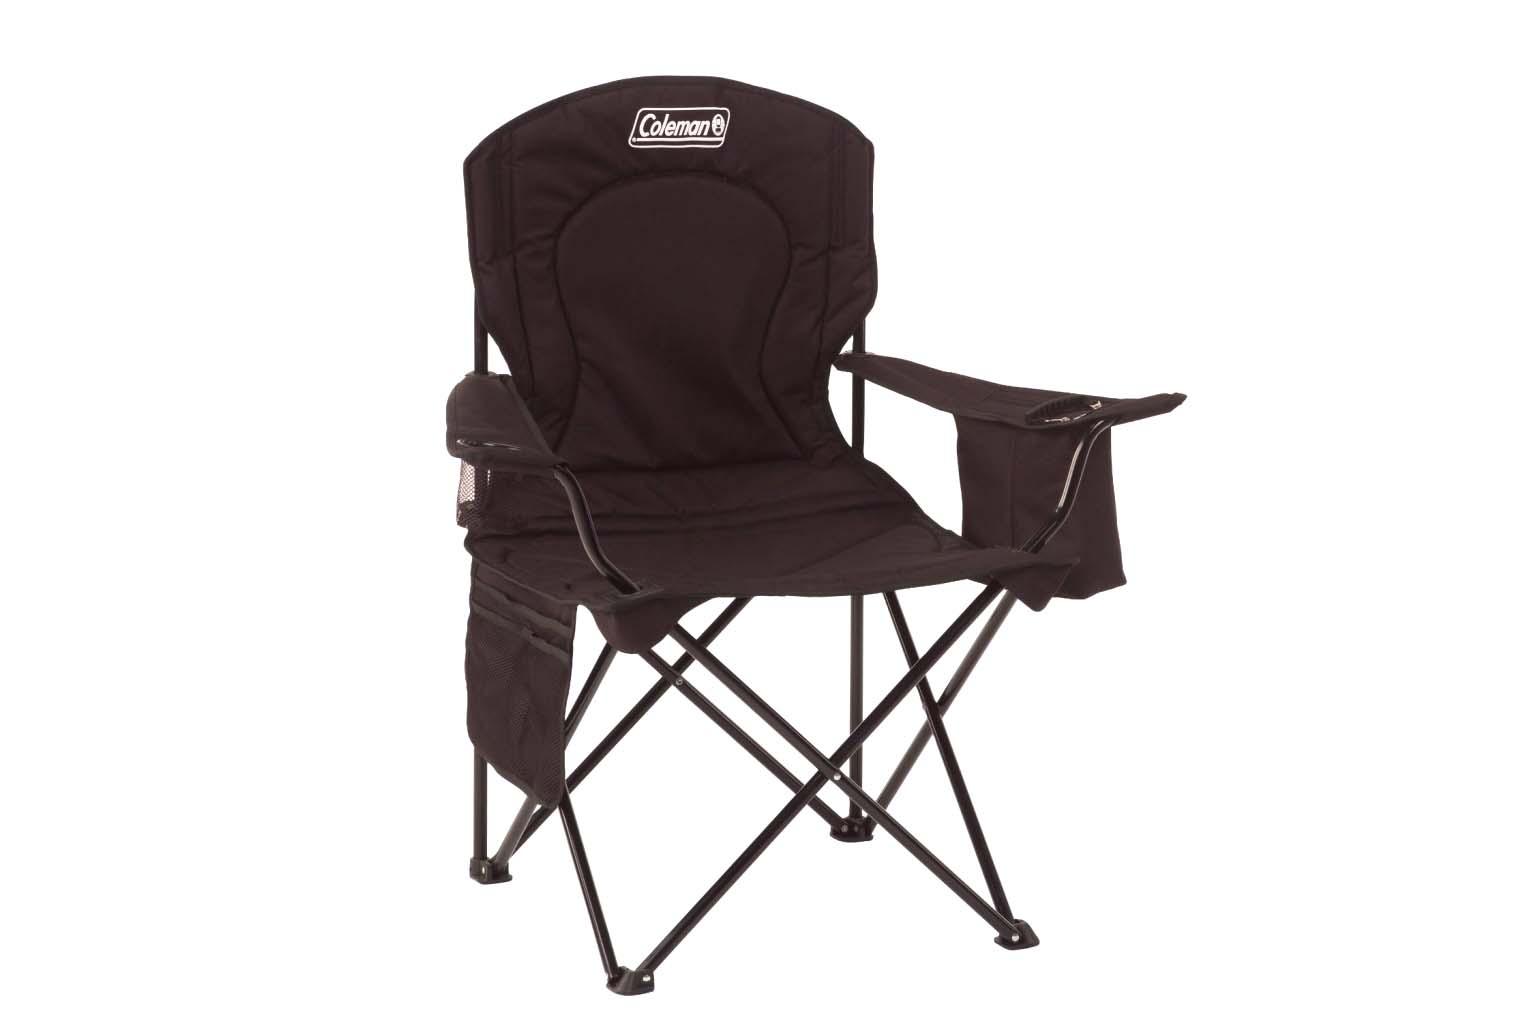 Oversized Folding Chair - 4.5 stars - $22 (Prime)